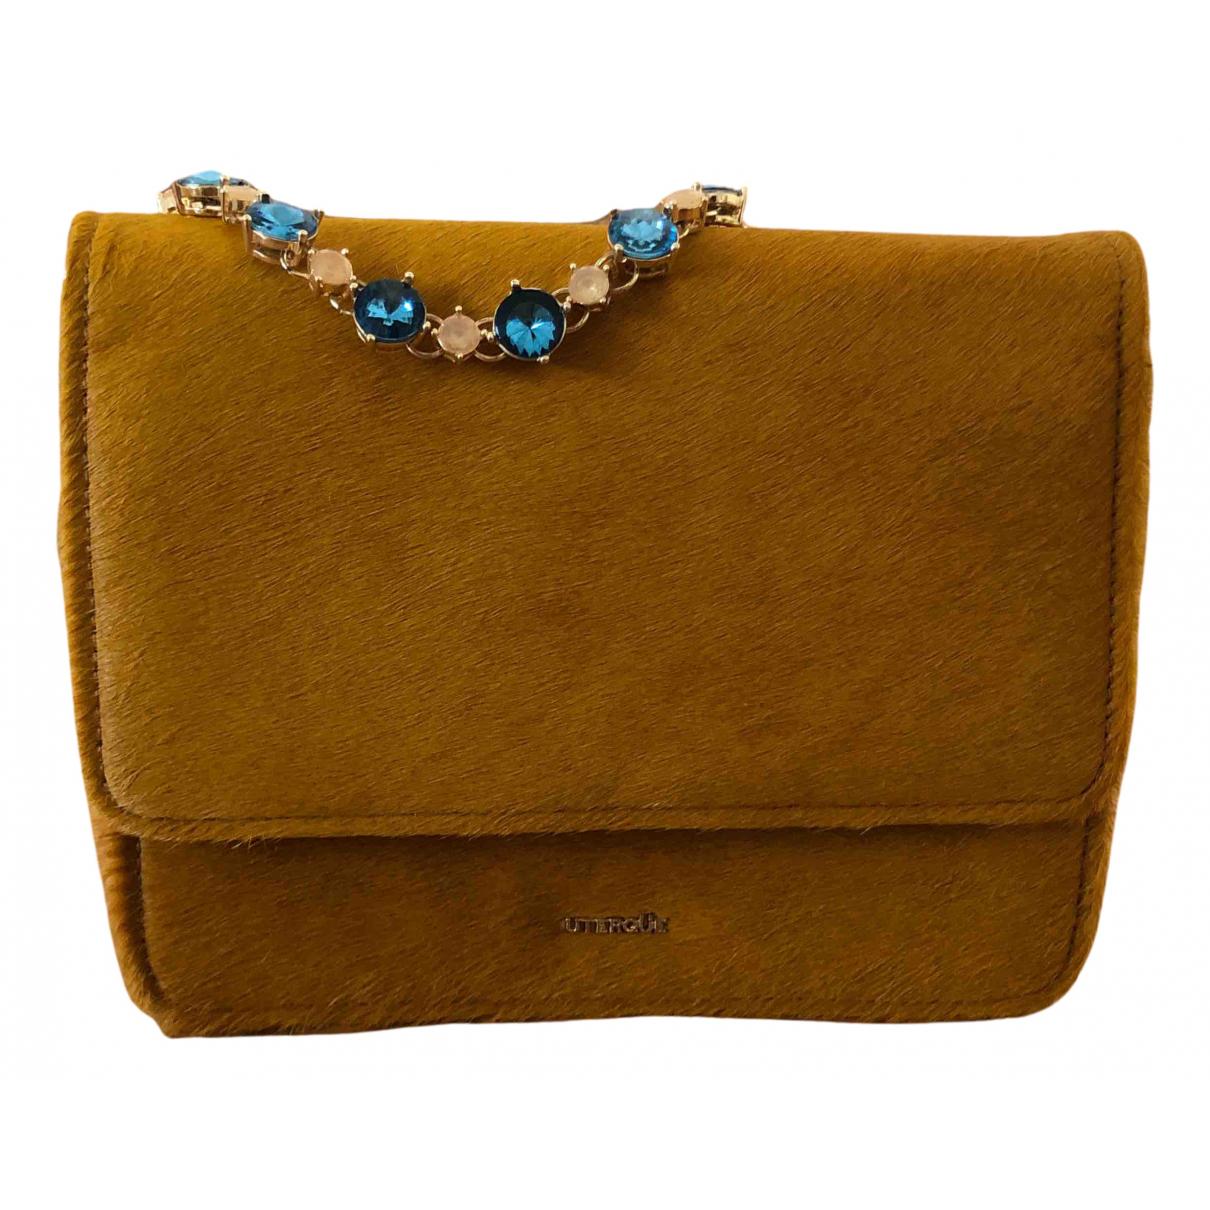 Uterque N Yellow Cloth handbag for Women N